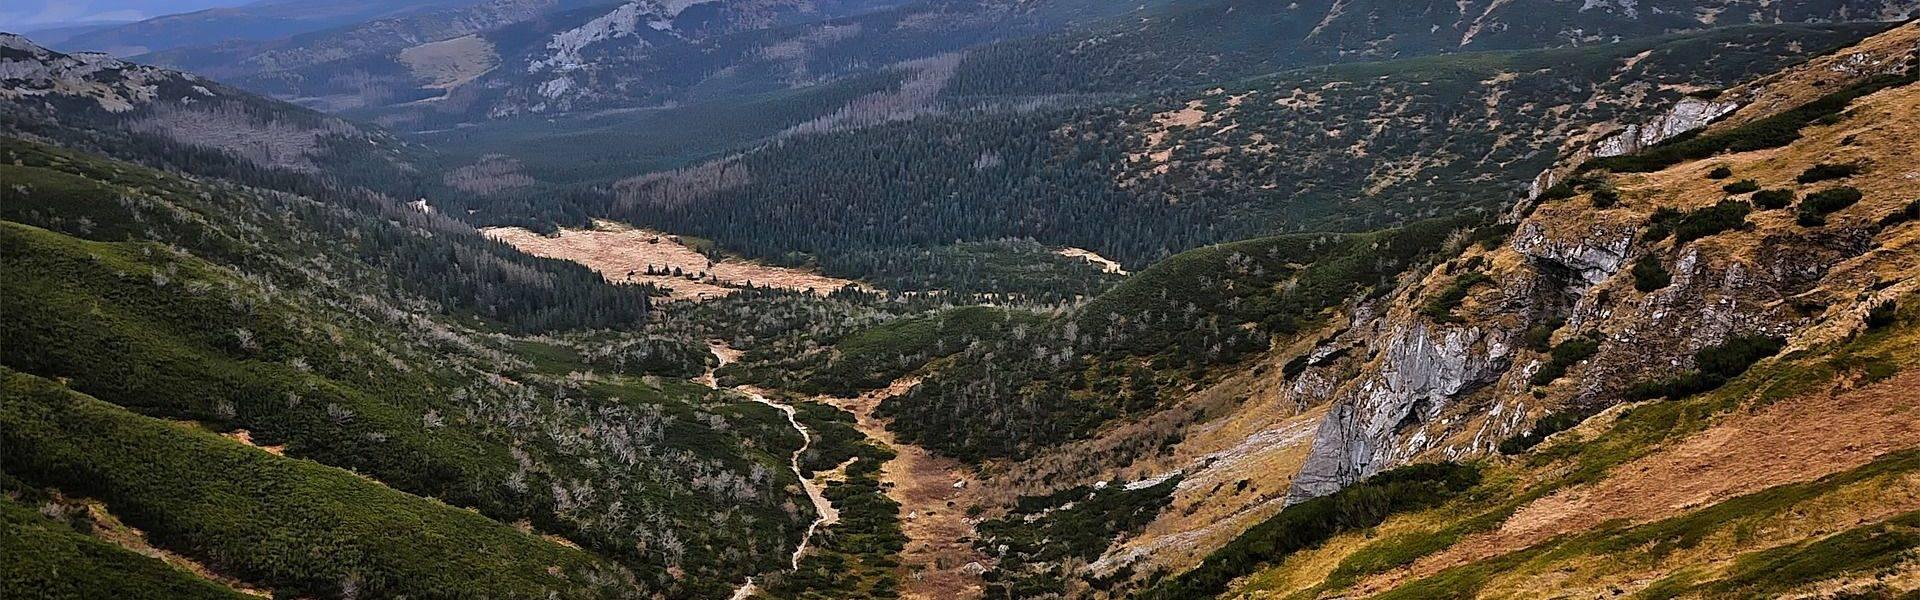 Dolina górska